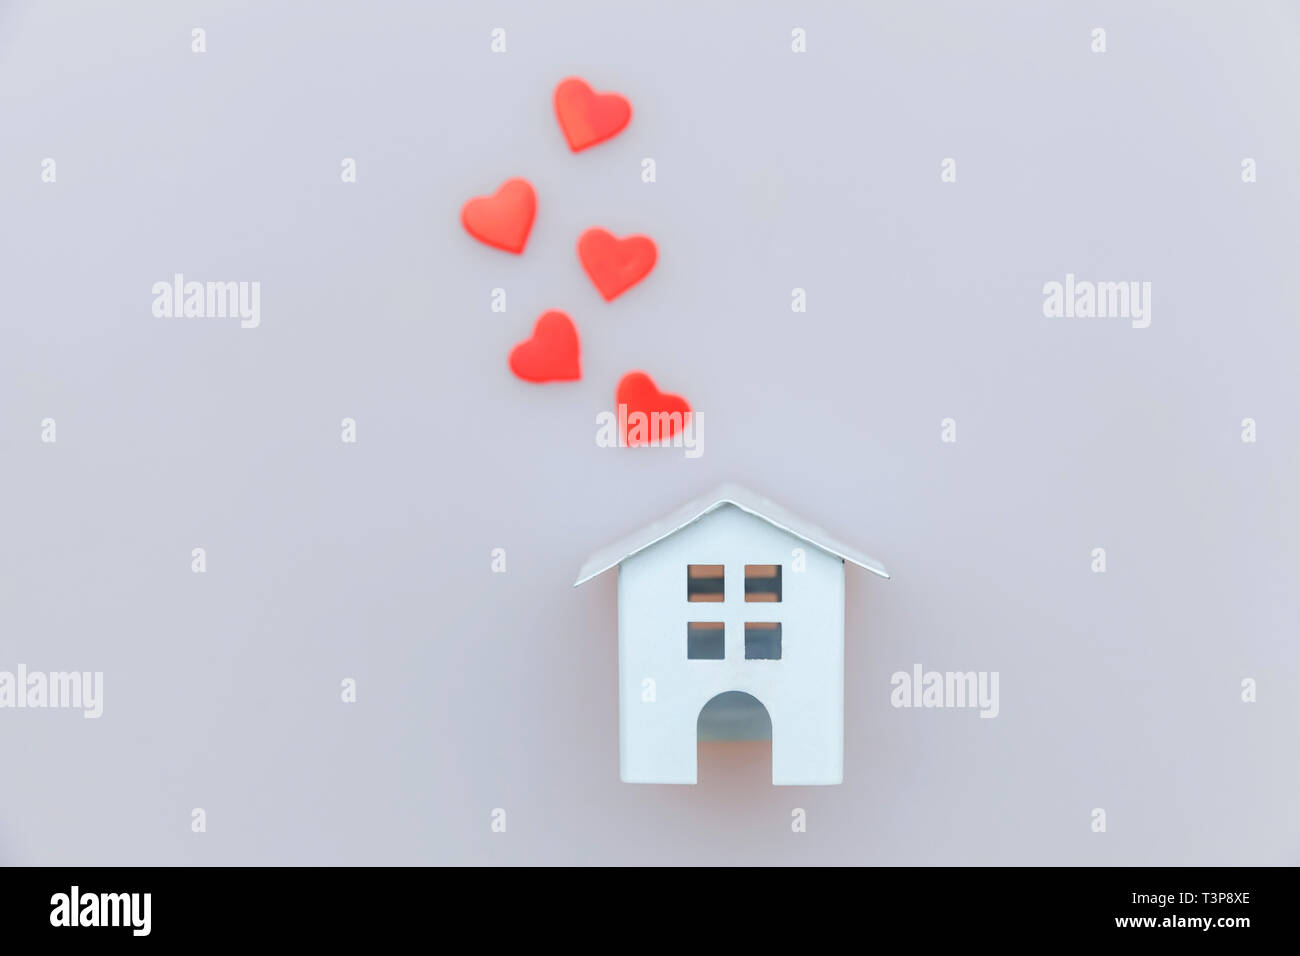 Heart Sale Stock Photos & Heart Sale Stock Images - Alamy